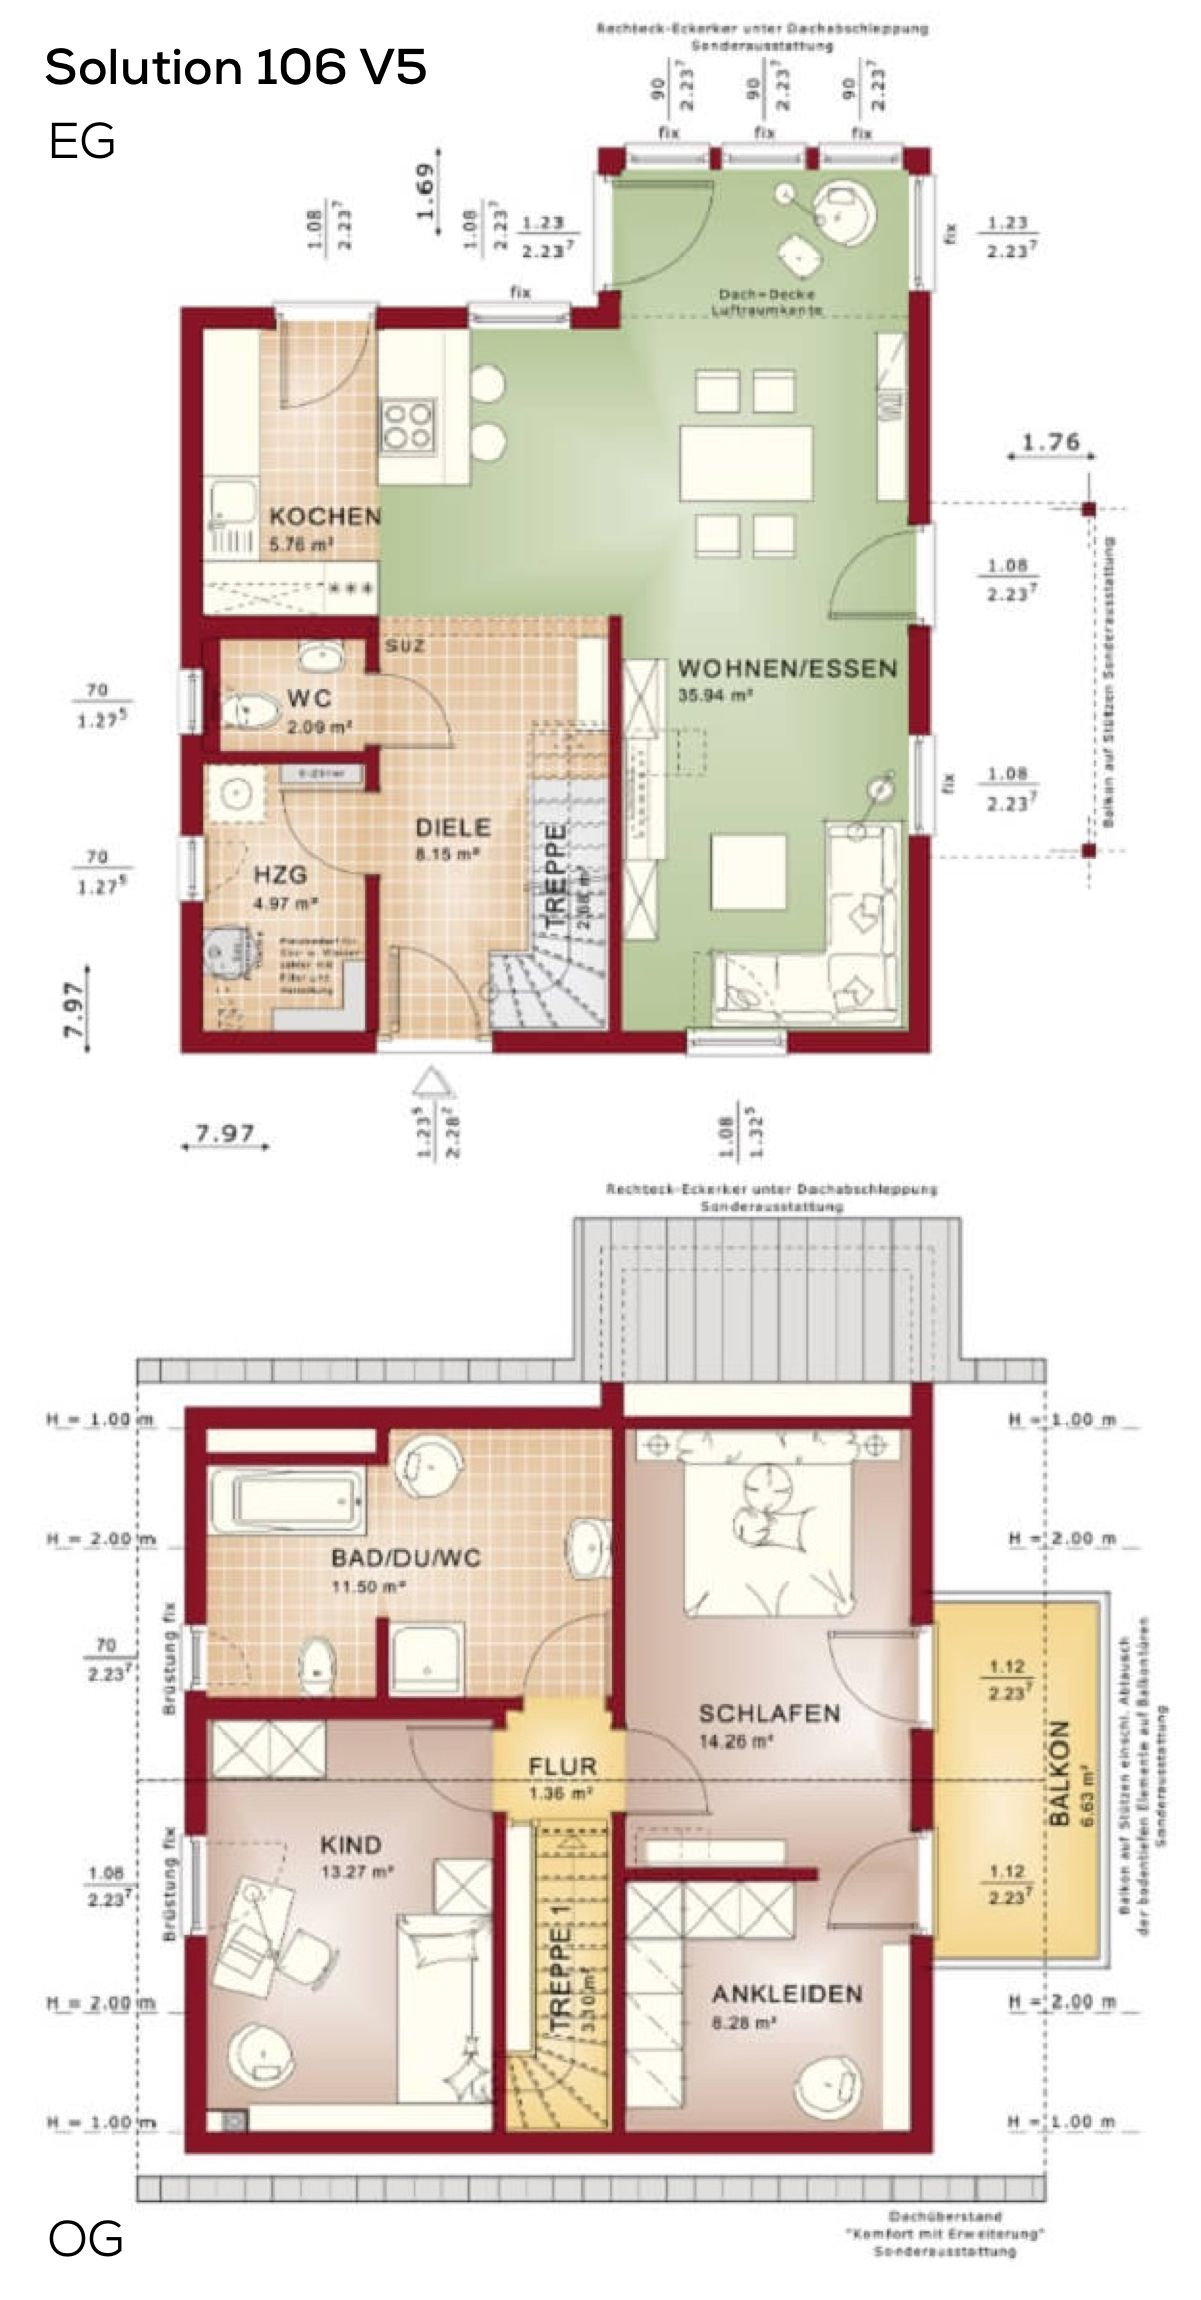 grundrisse einfamilienhaus satteldach 3 zimmer grundriss erdgeschoss offen erker treppe. Black Bedroom Furniture Sets. Home Design Ideas